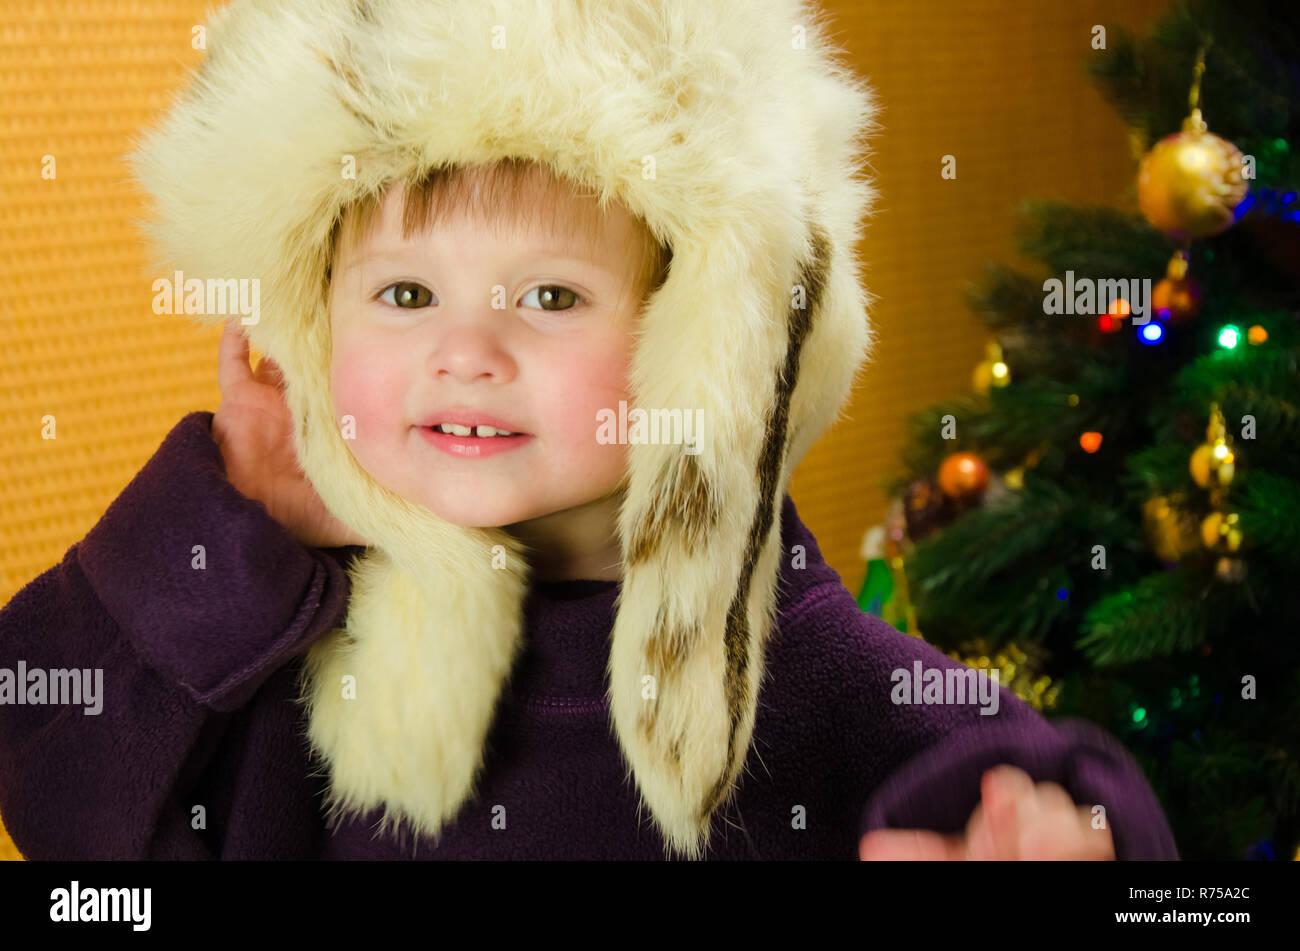 73b82a27afd6 Fur Hat Stock Photos   Fur Hat Stock Images - Alamy